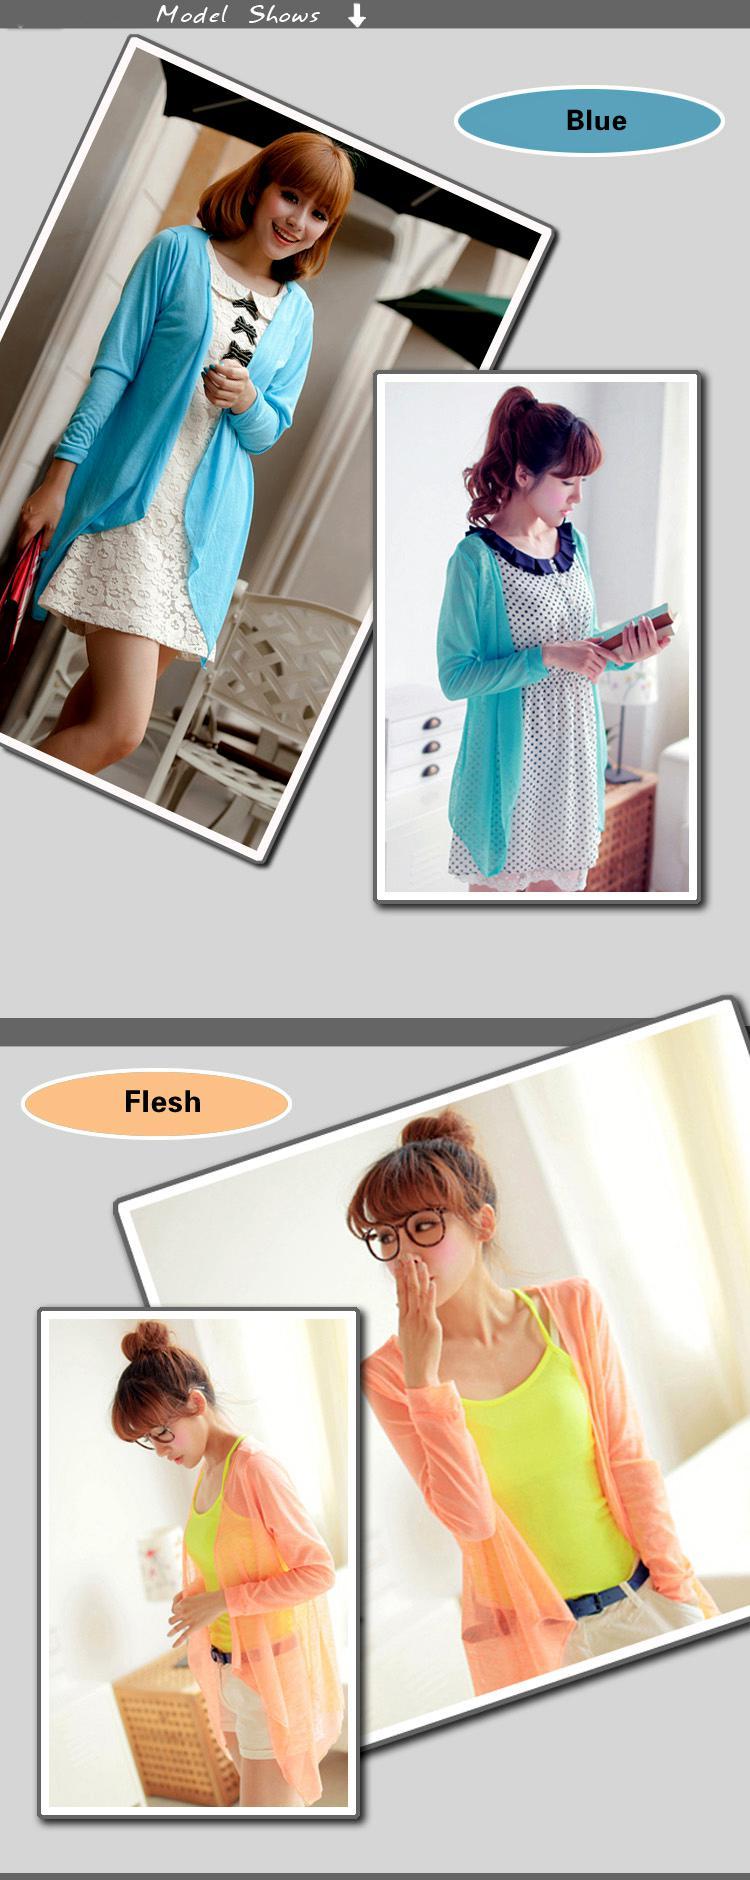 Summer Sun Blusas lentejuelas Transparent Sun Protection Ropa de algodón Color de la mezcla Prevenir Bask en Ropa